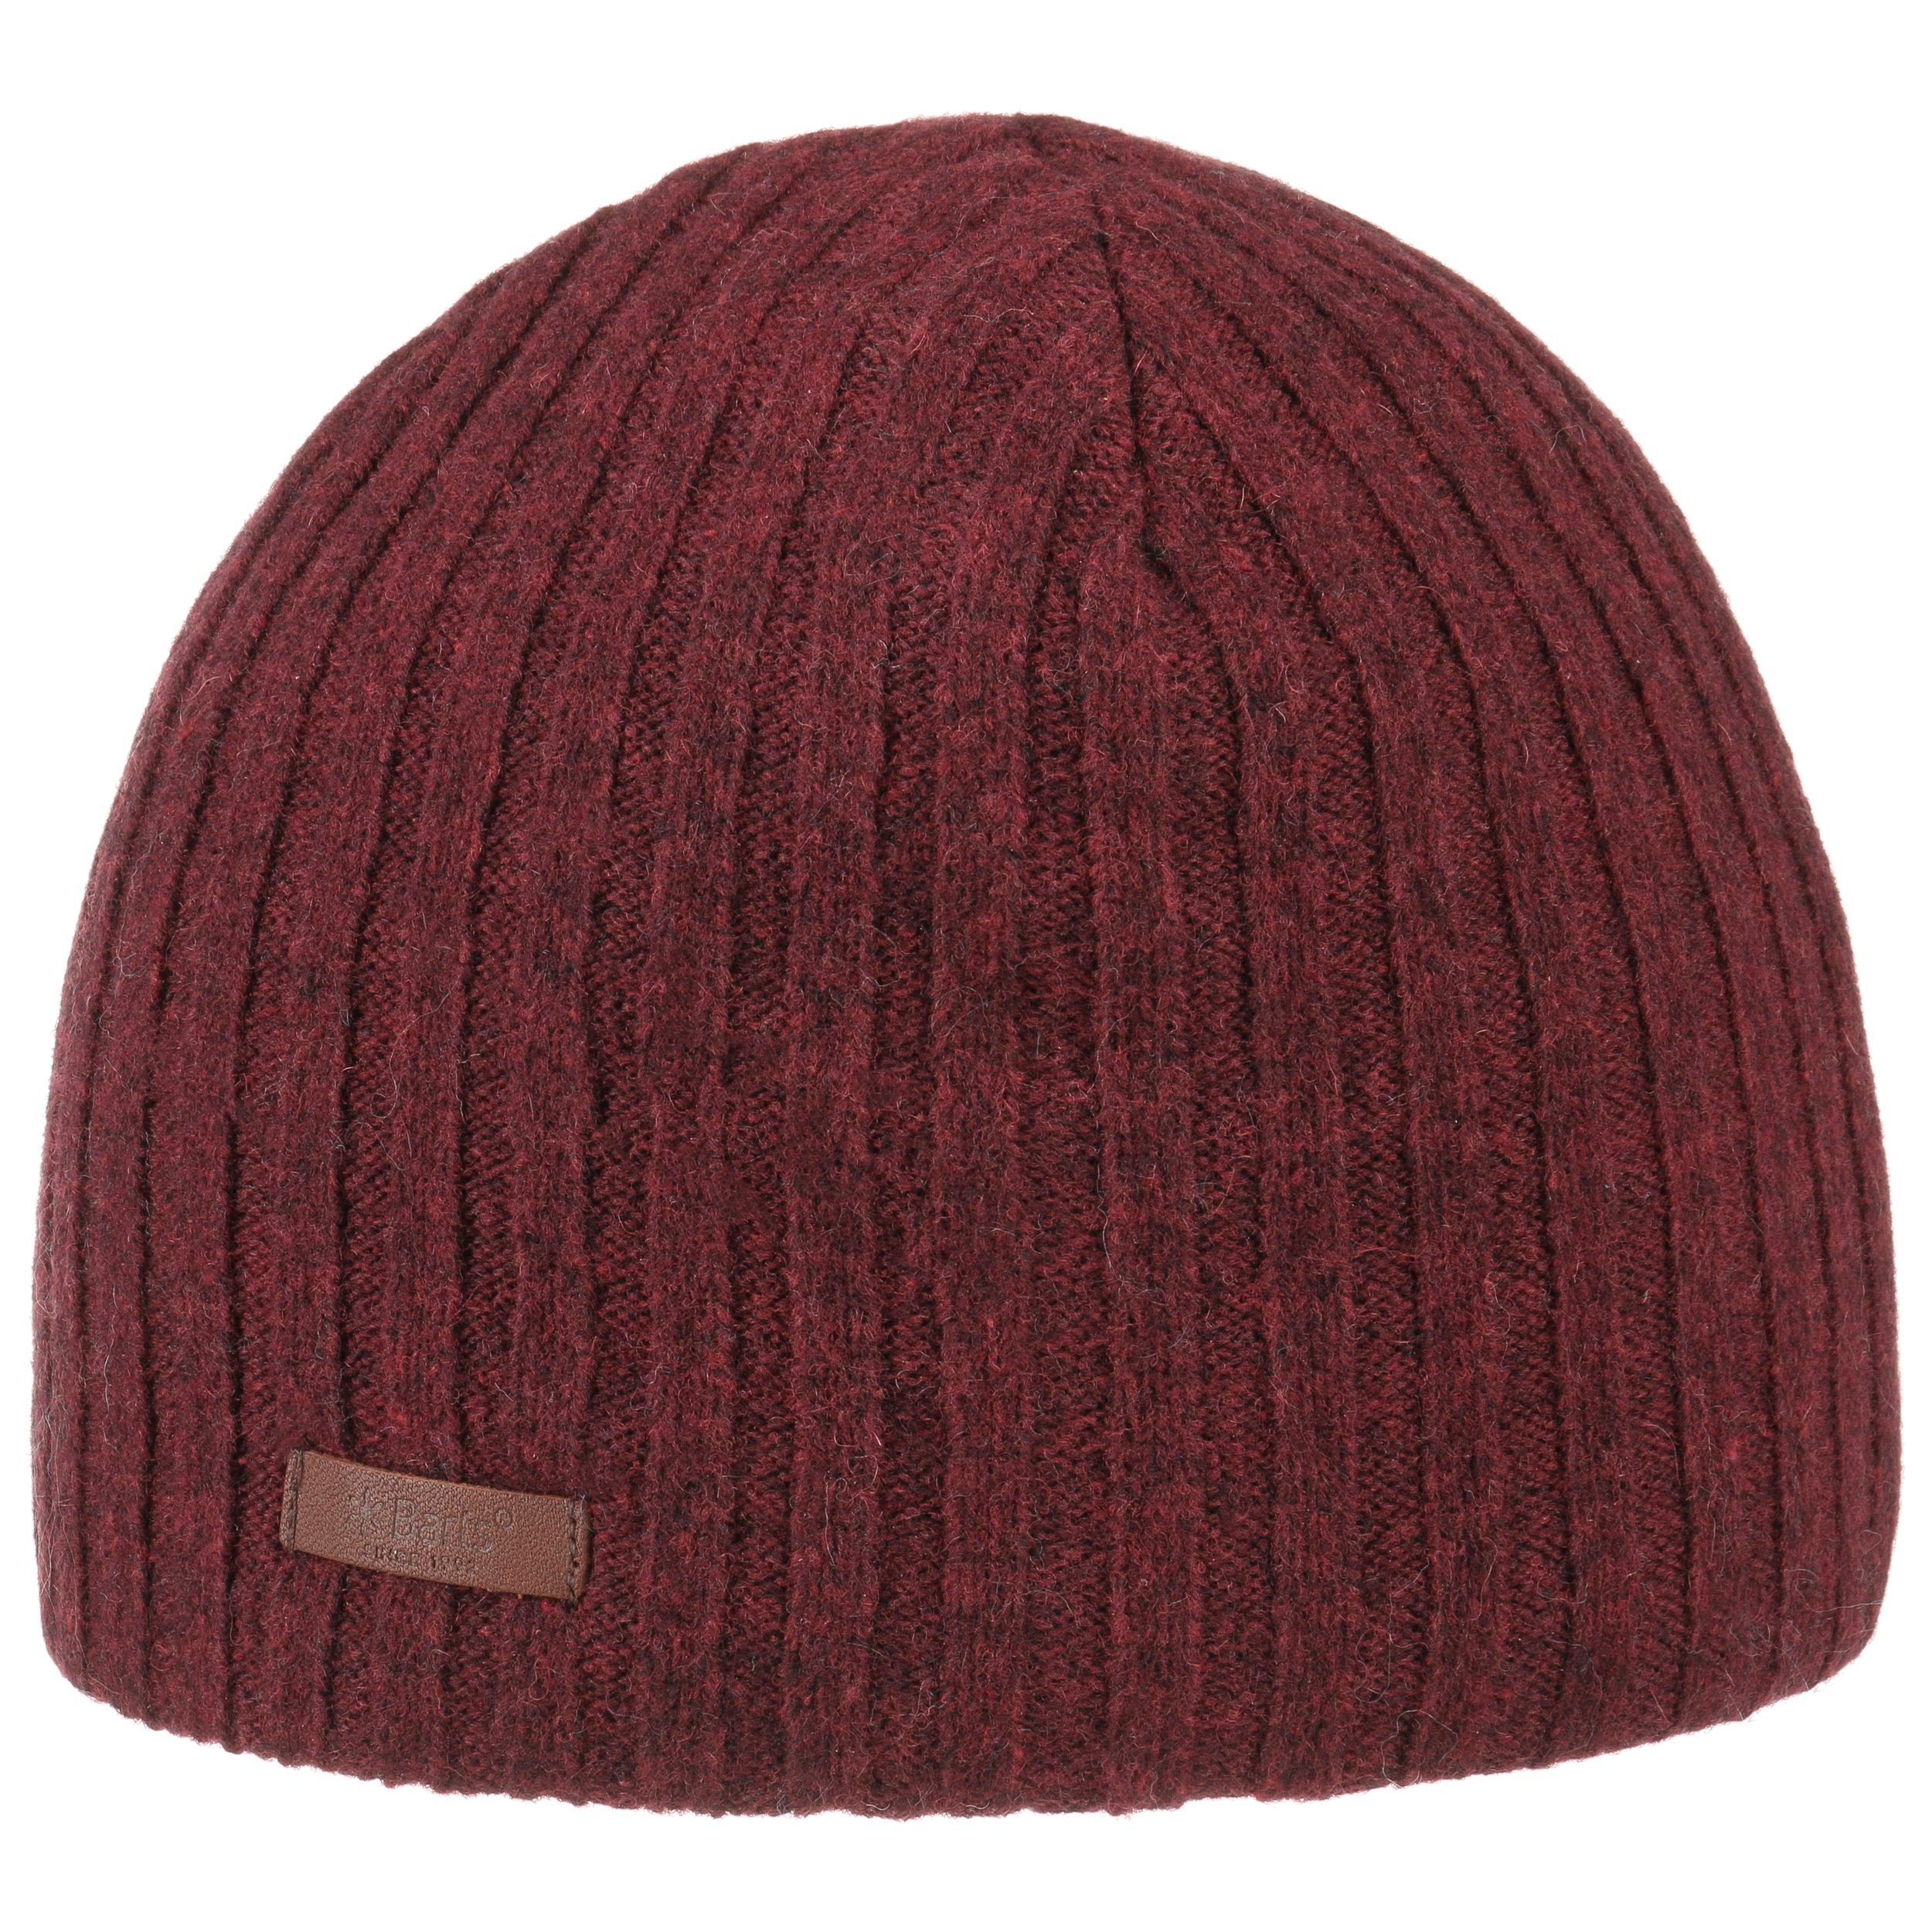 179fff4fb3d Haakon Lambswool Knit Hat by Barts